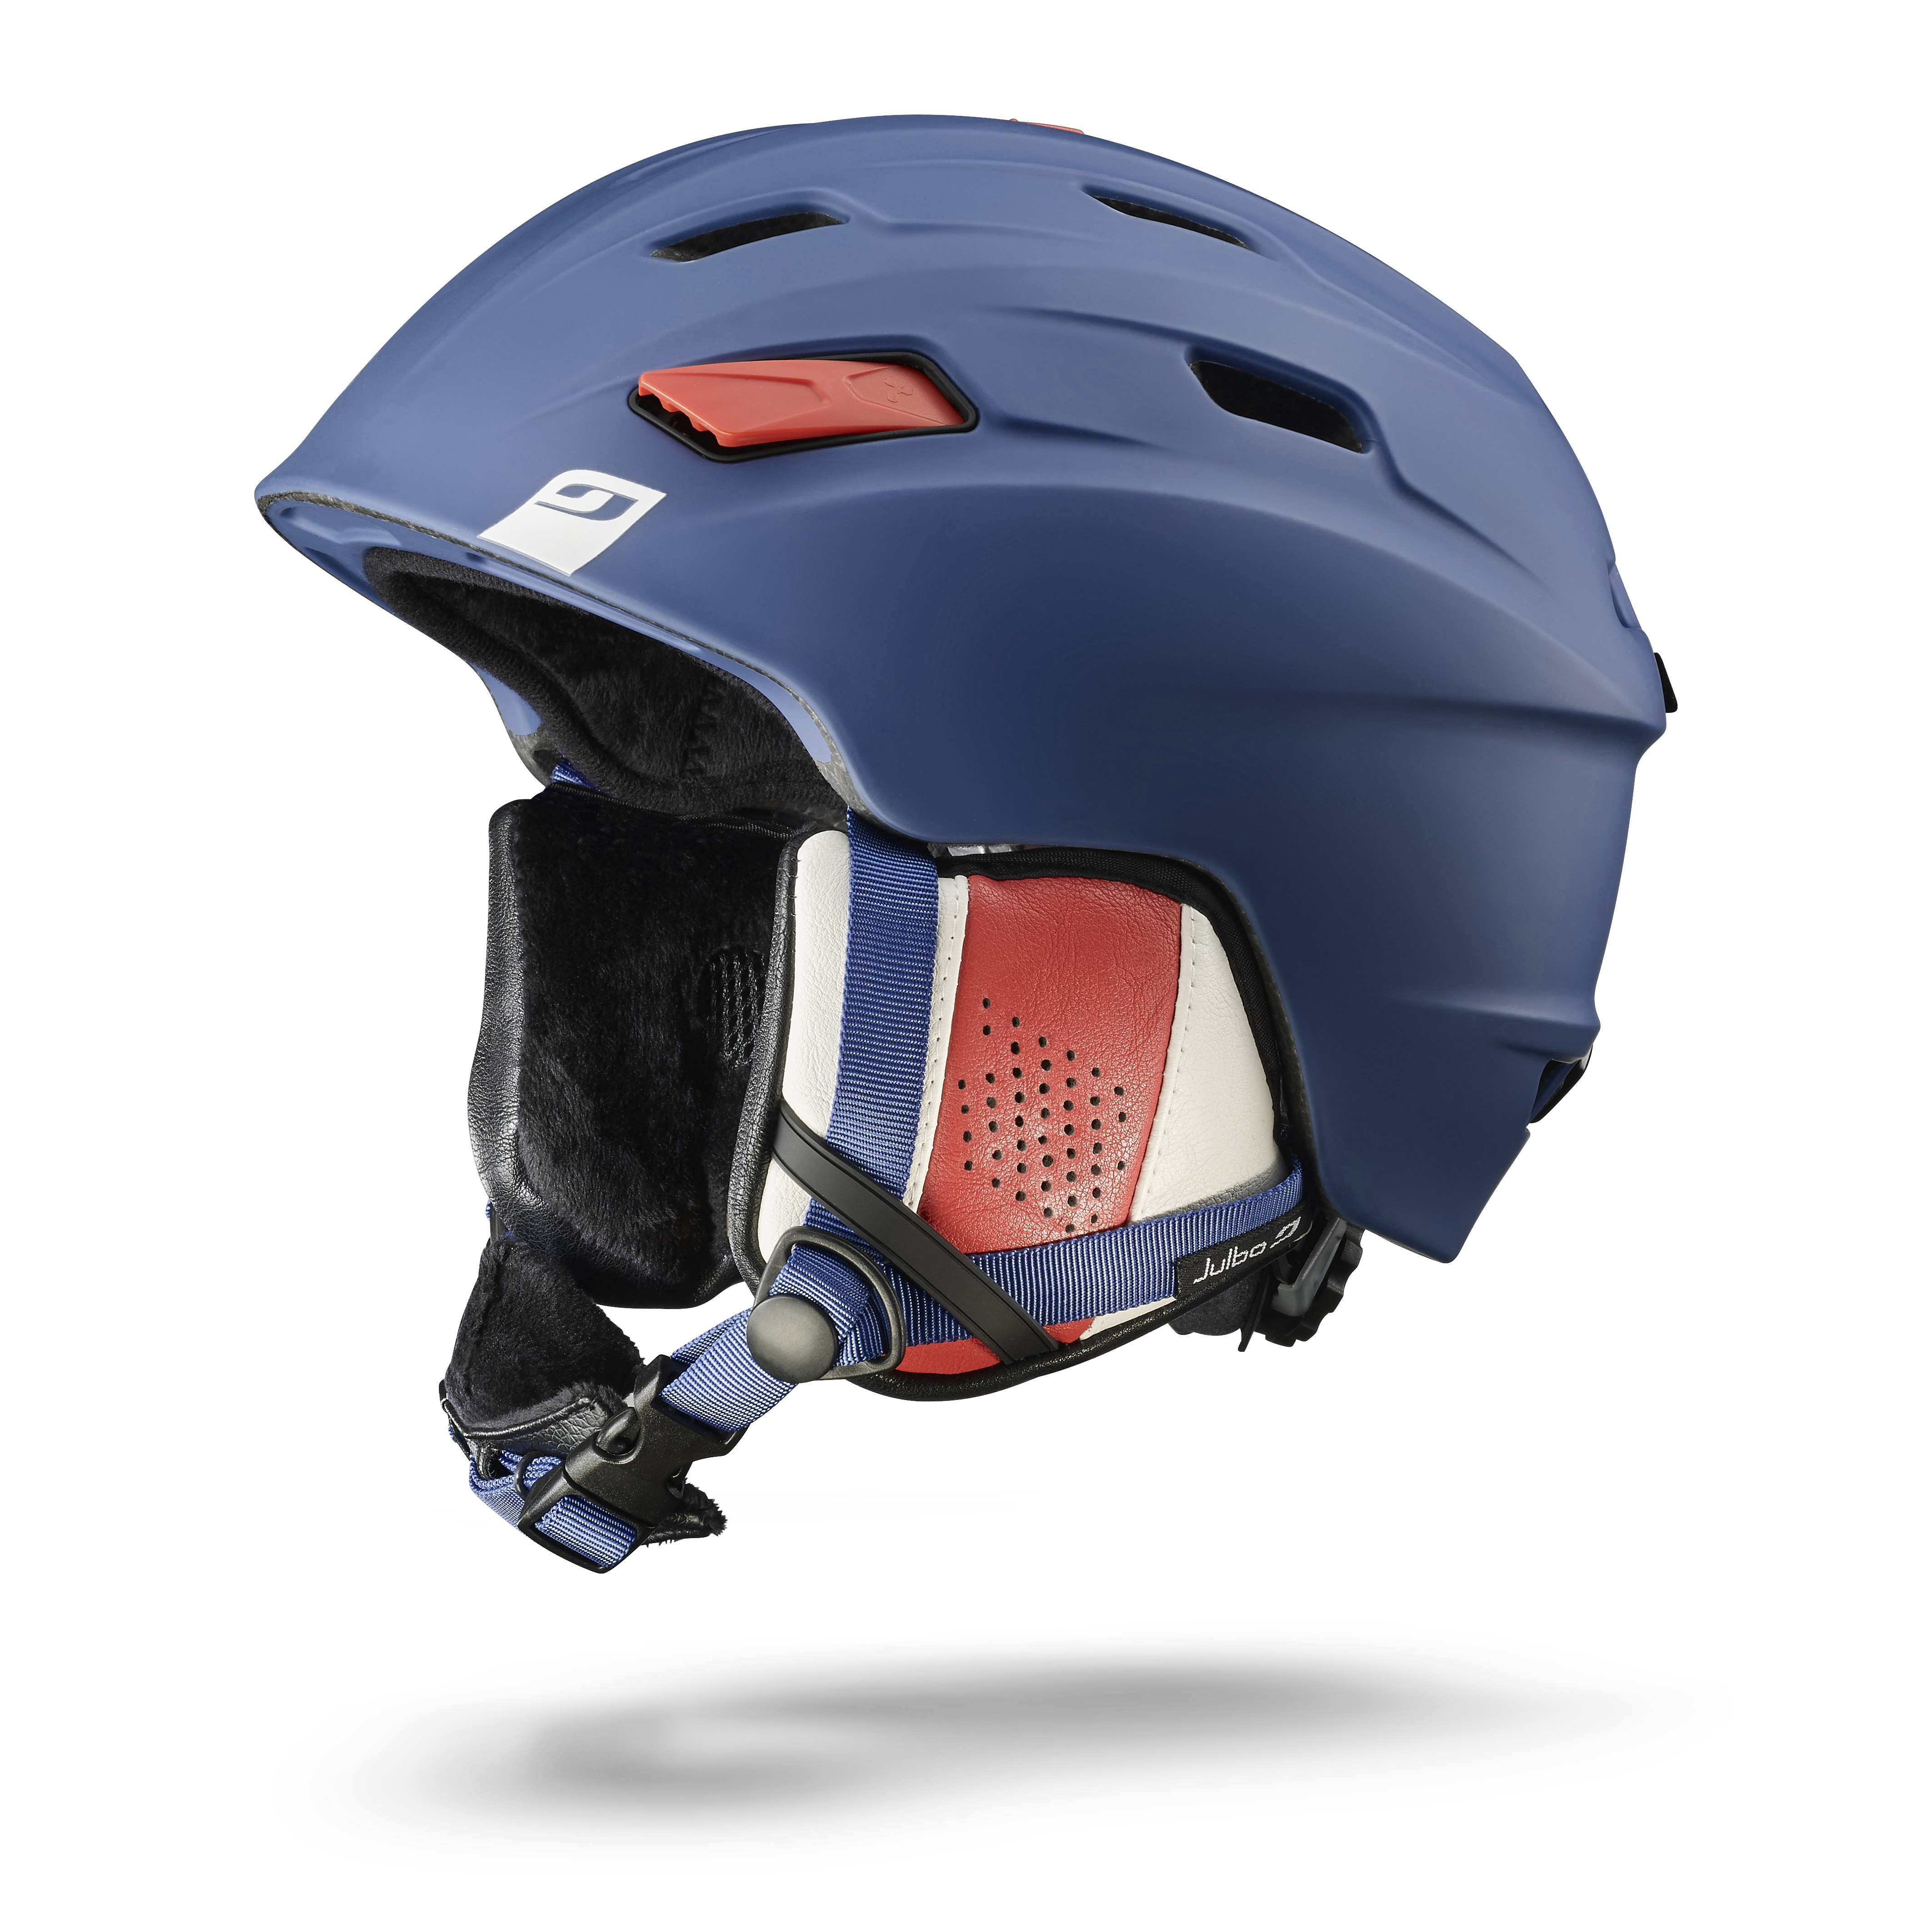 Image of   Julbo Mission Helmet - blue / white / red - L